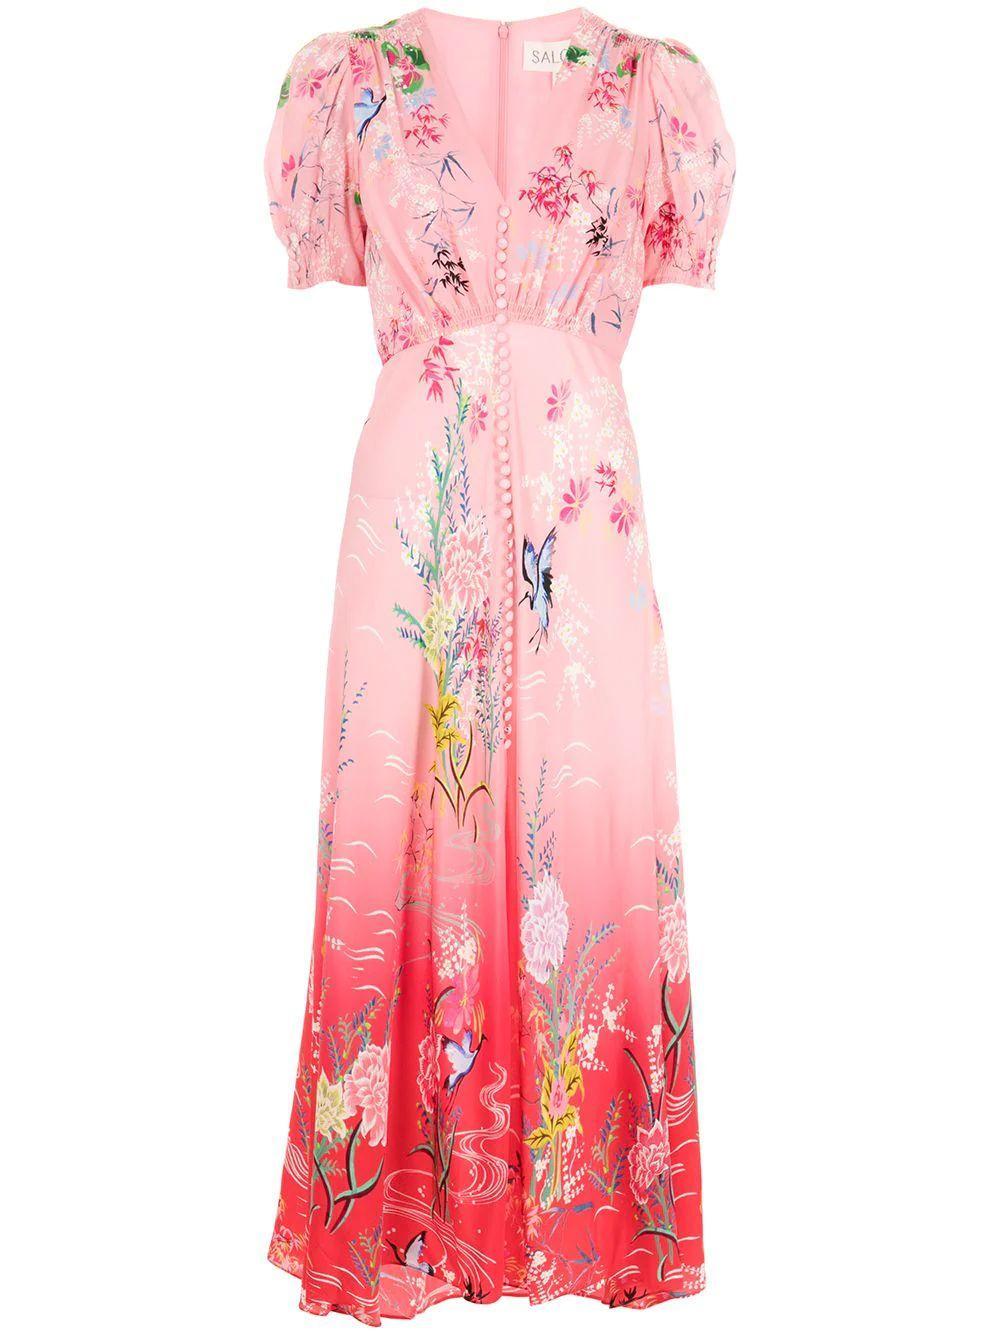 Lea Printed Dress Item # 1764-S21